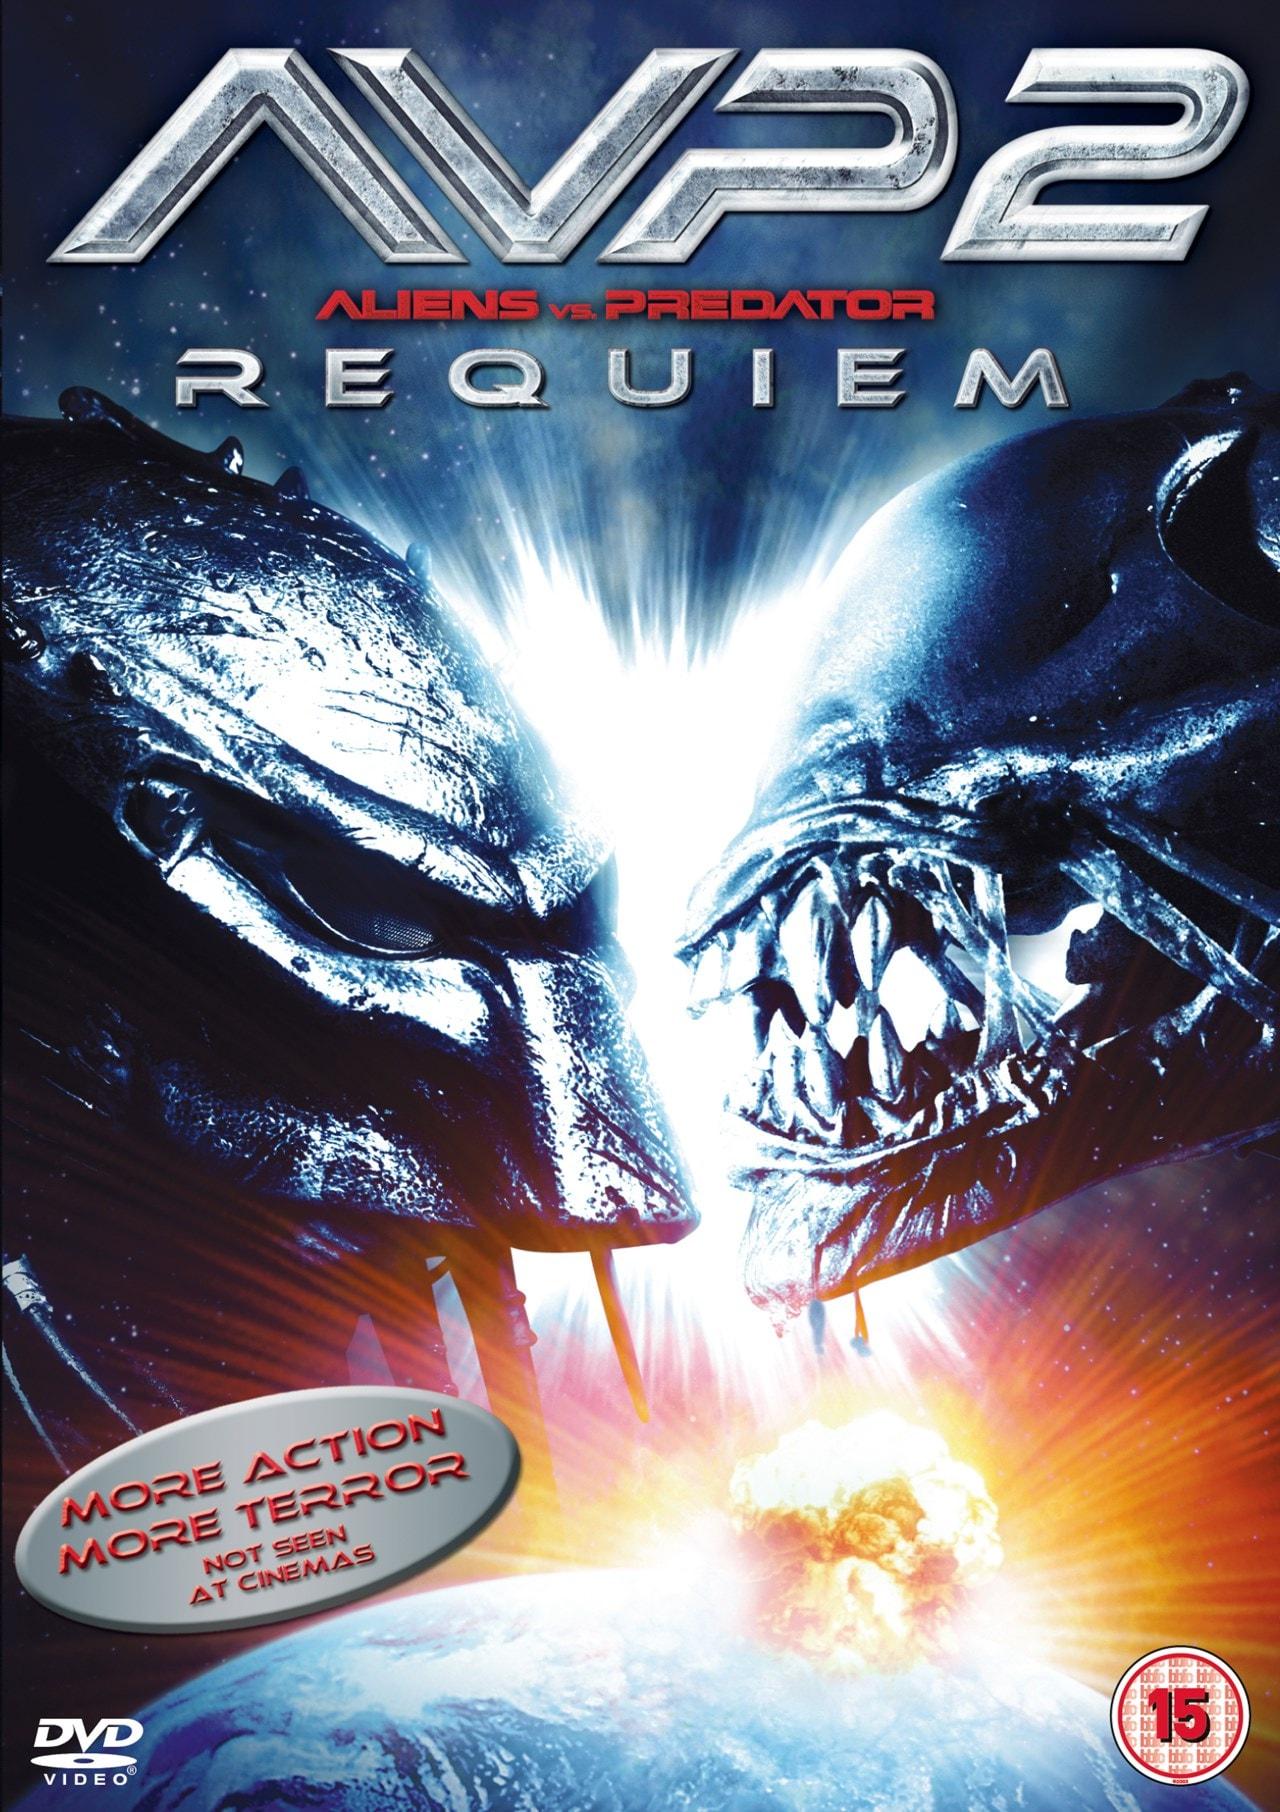 Aliens Vs Predator - Requiem - 1